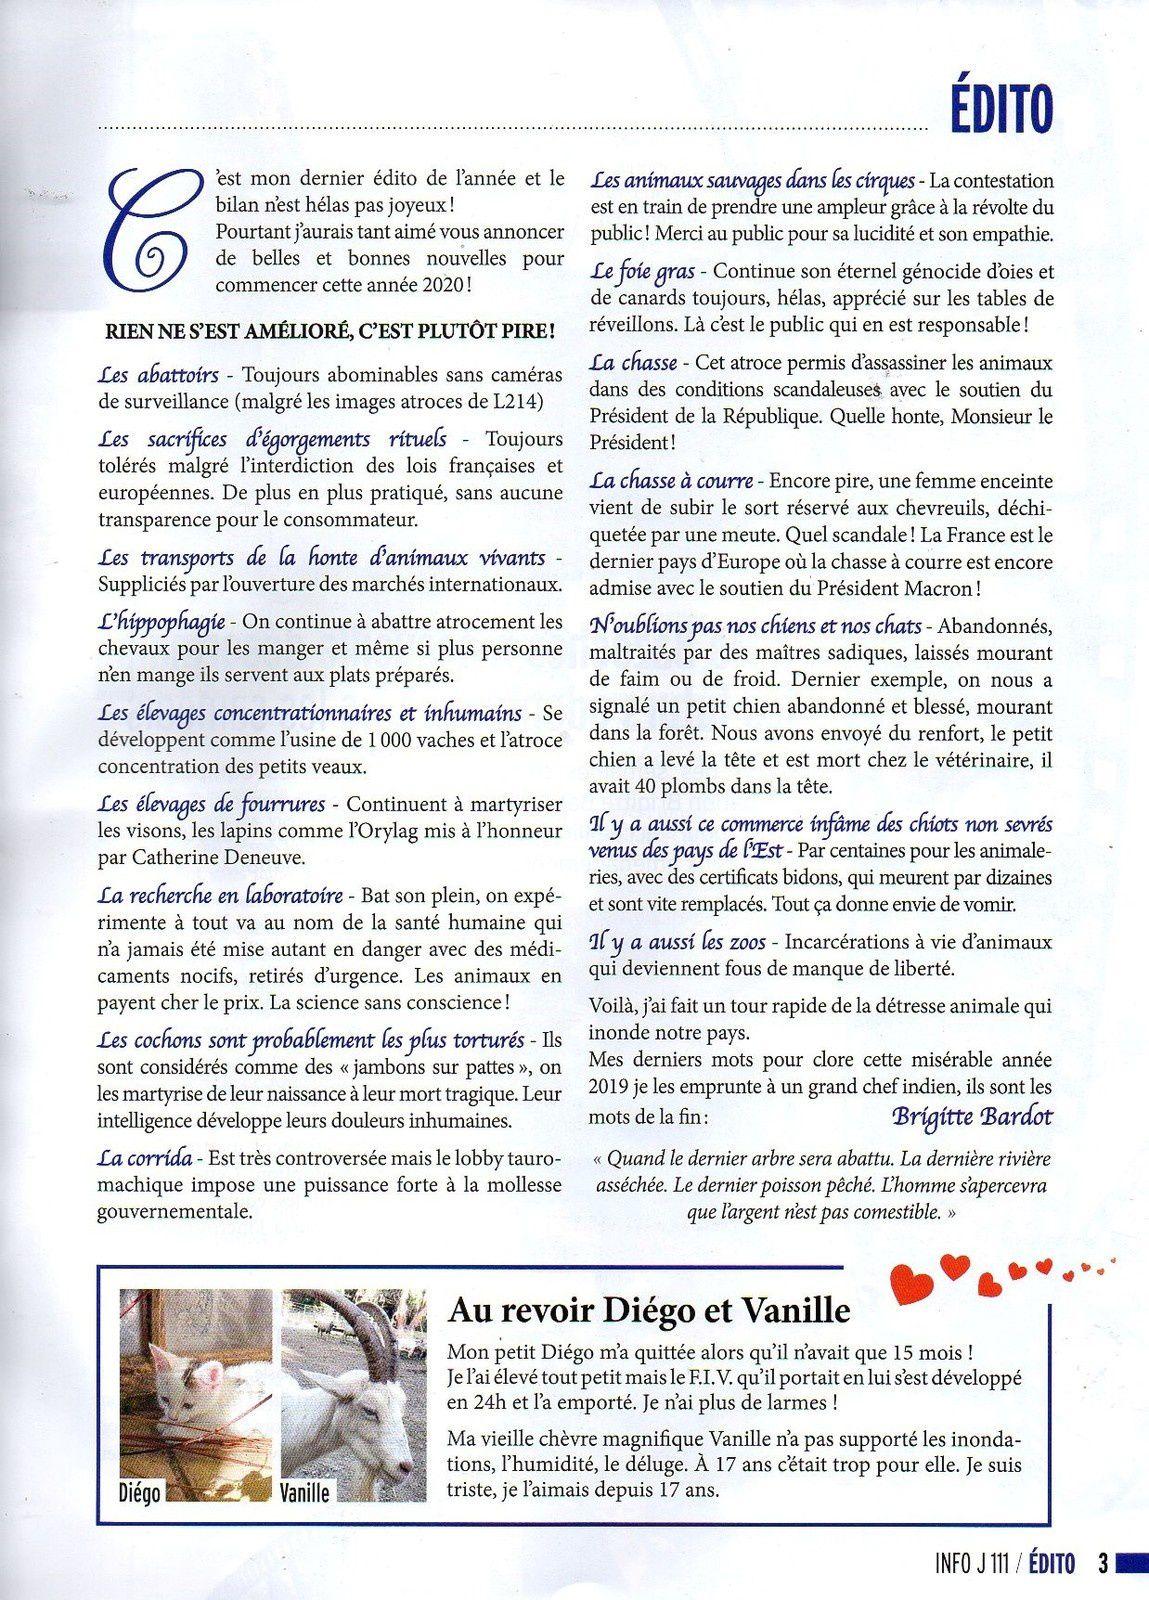 Info journal Fondation Brigitte Bardot 4ème trimestre 2019